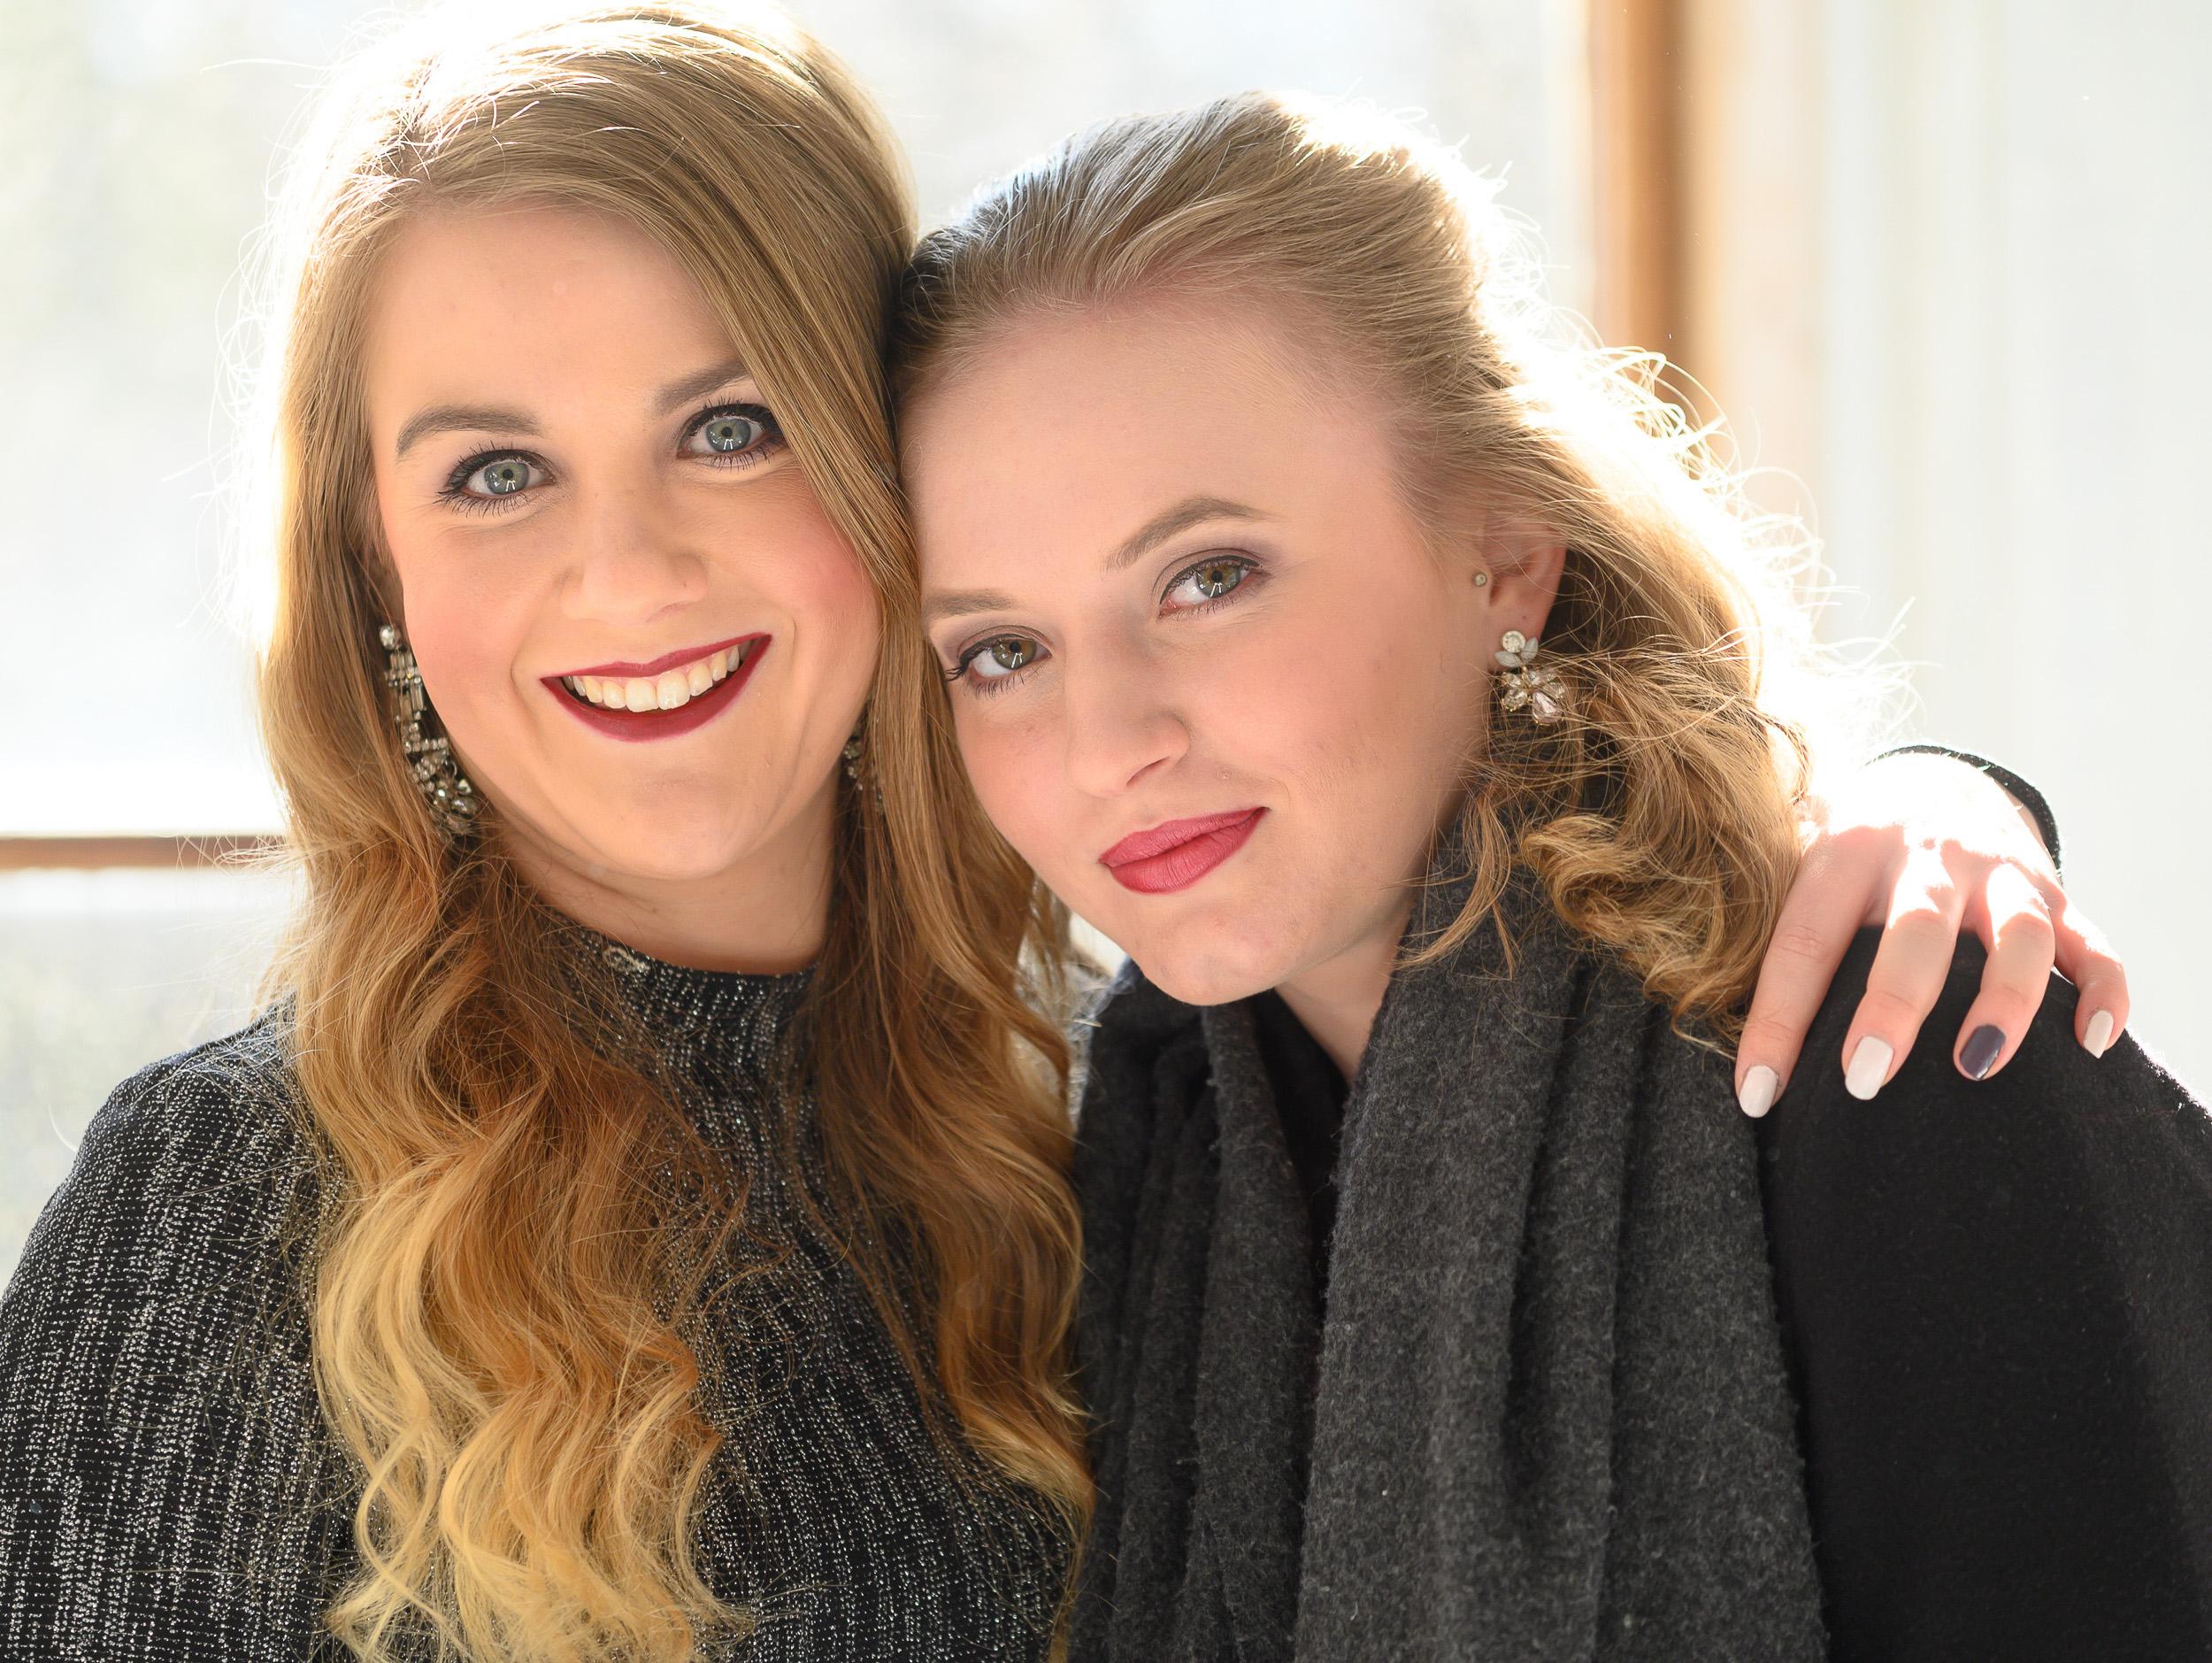 Två tjejer